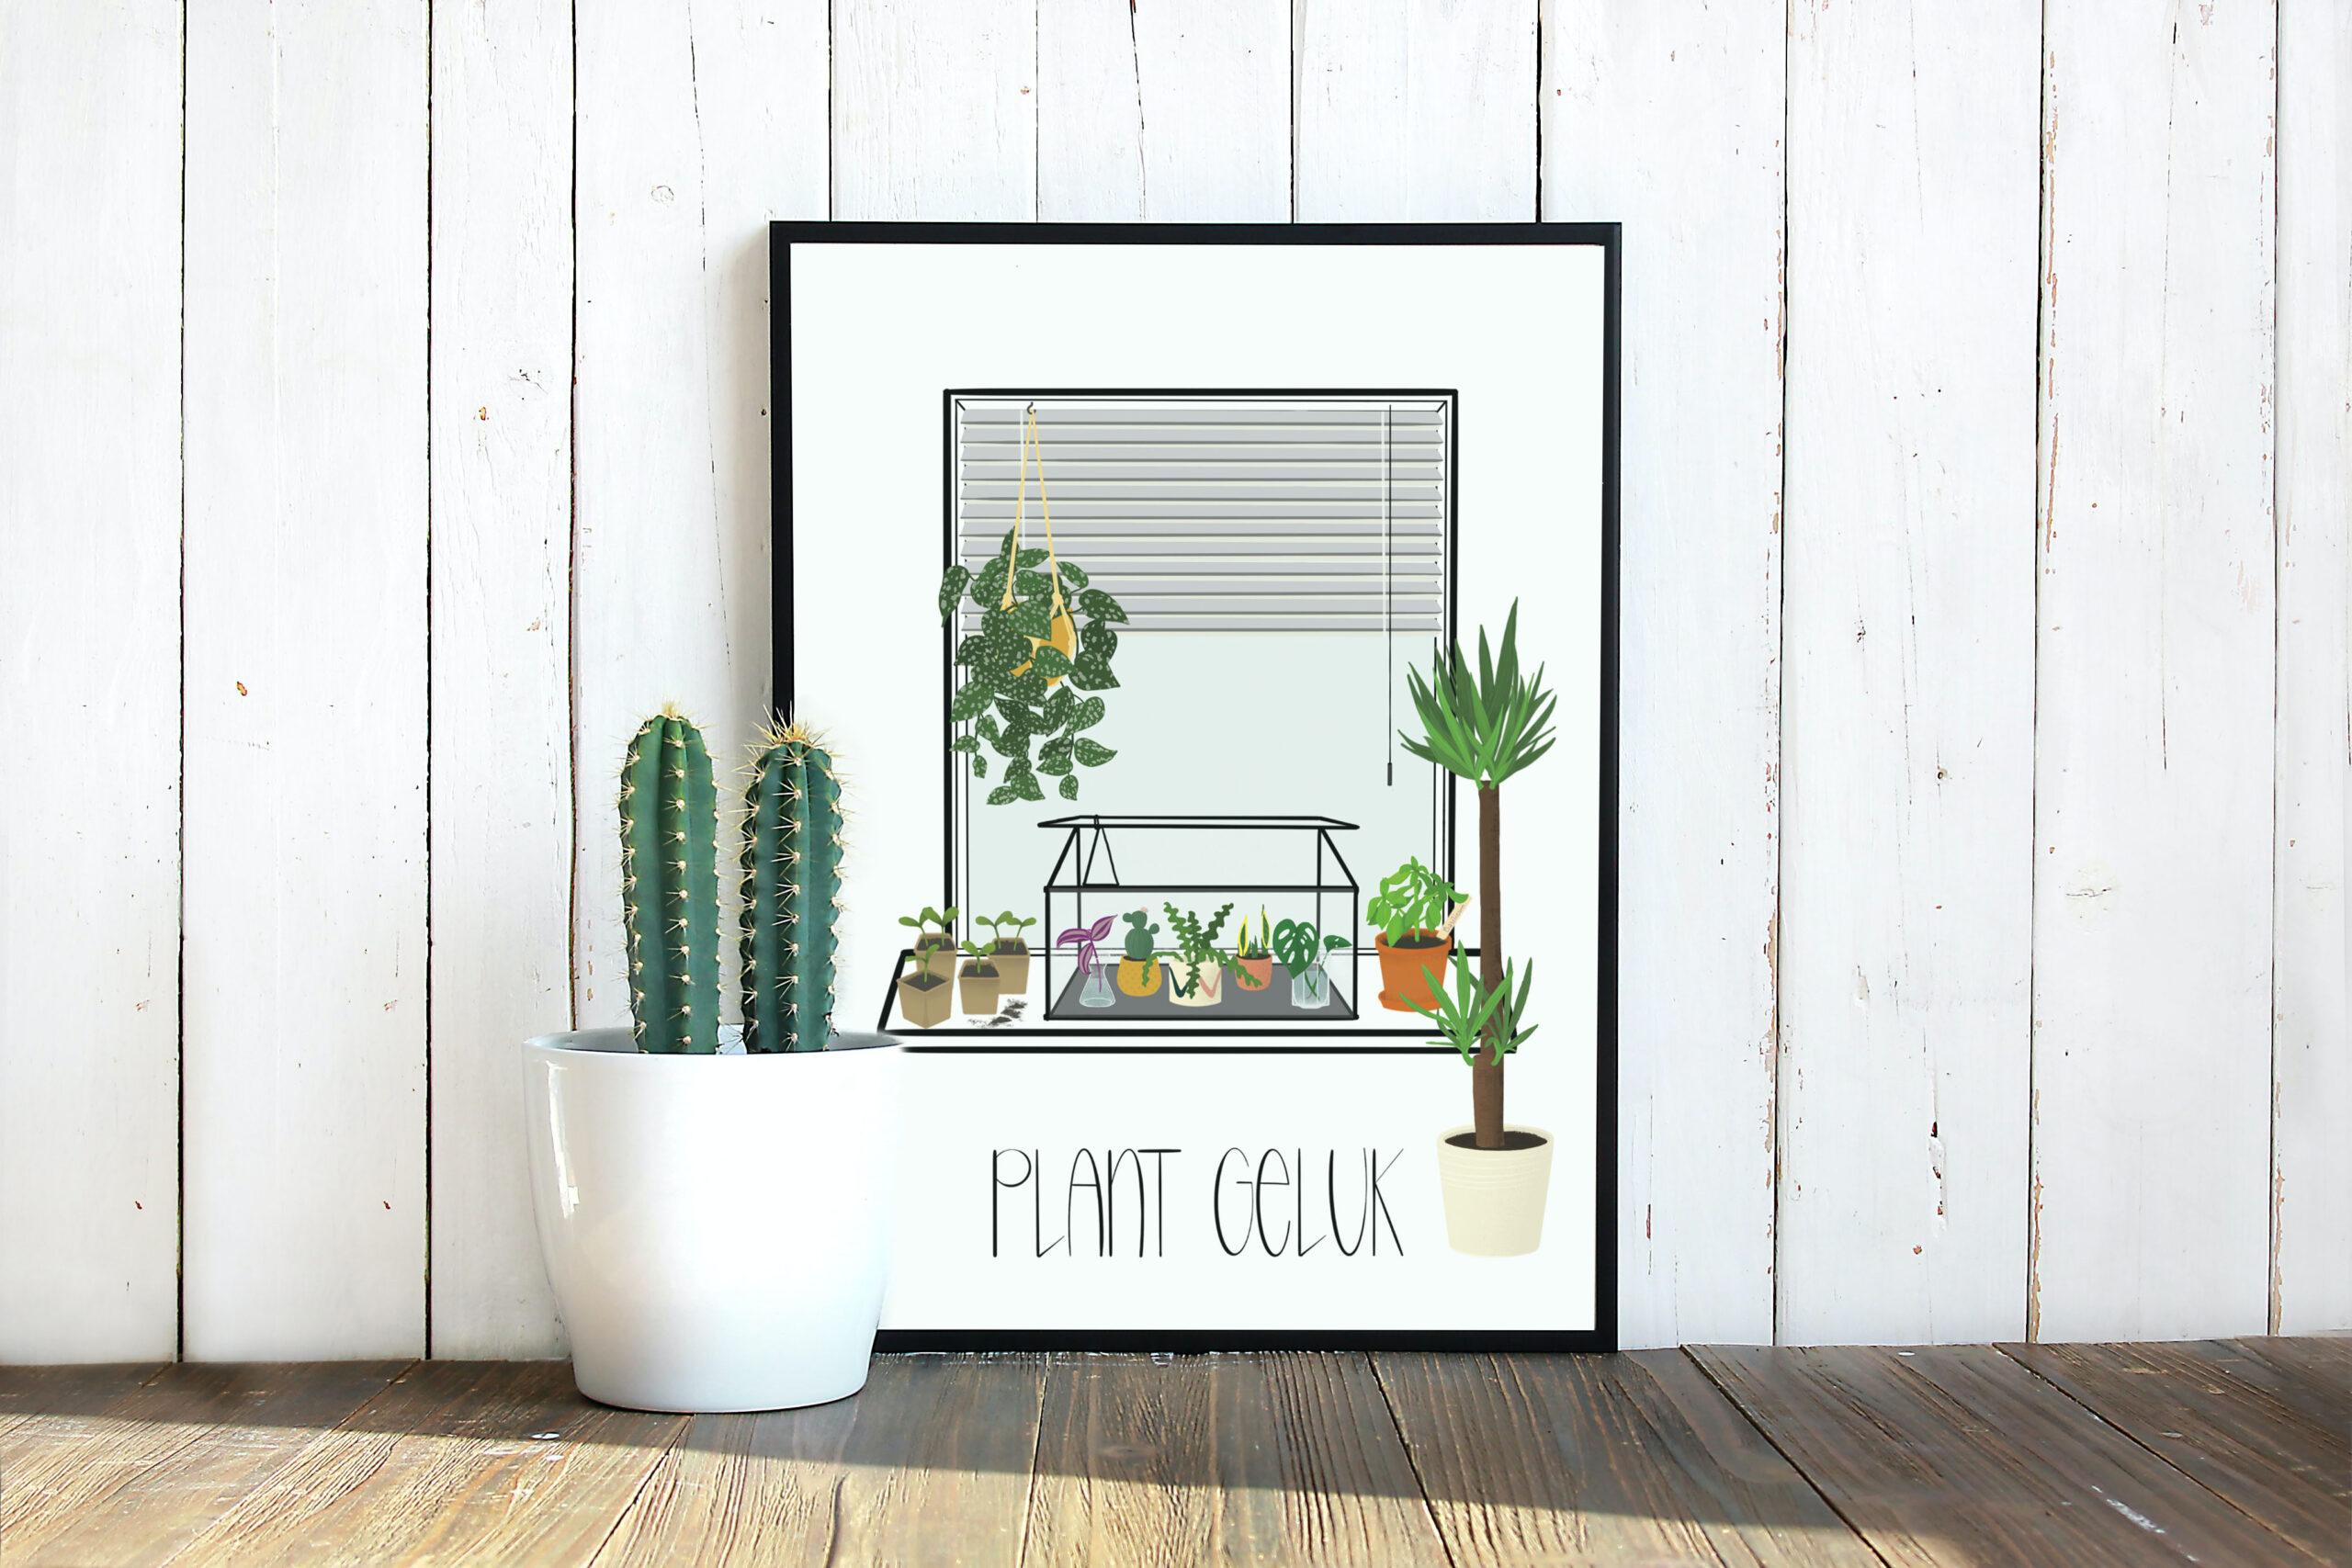 poster-plant-geluk